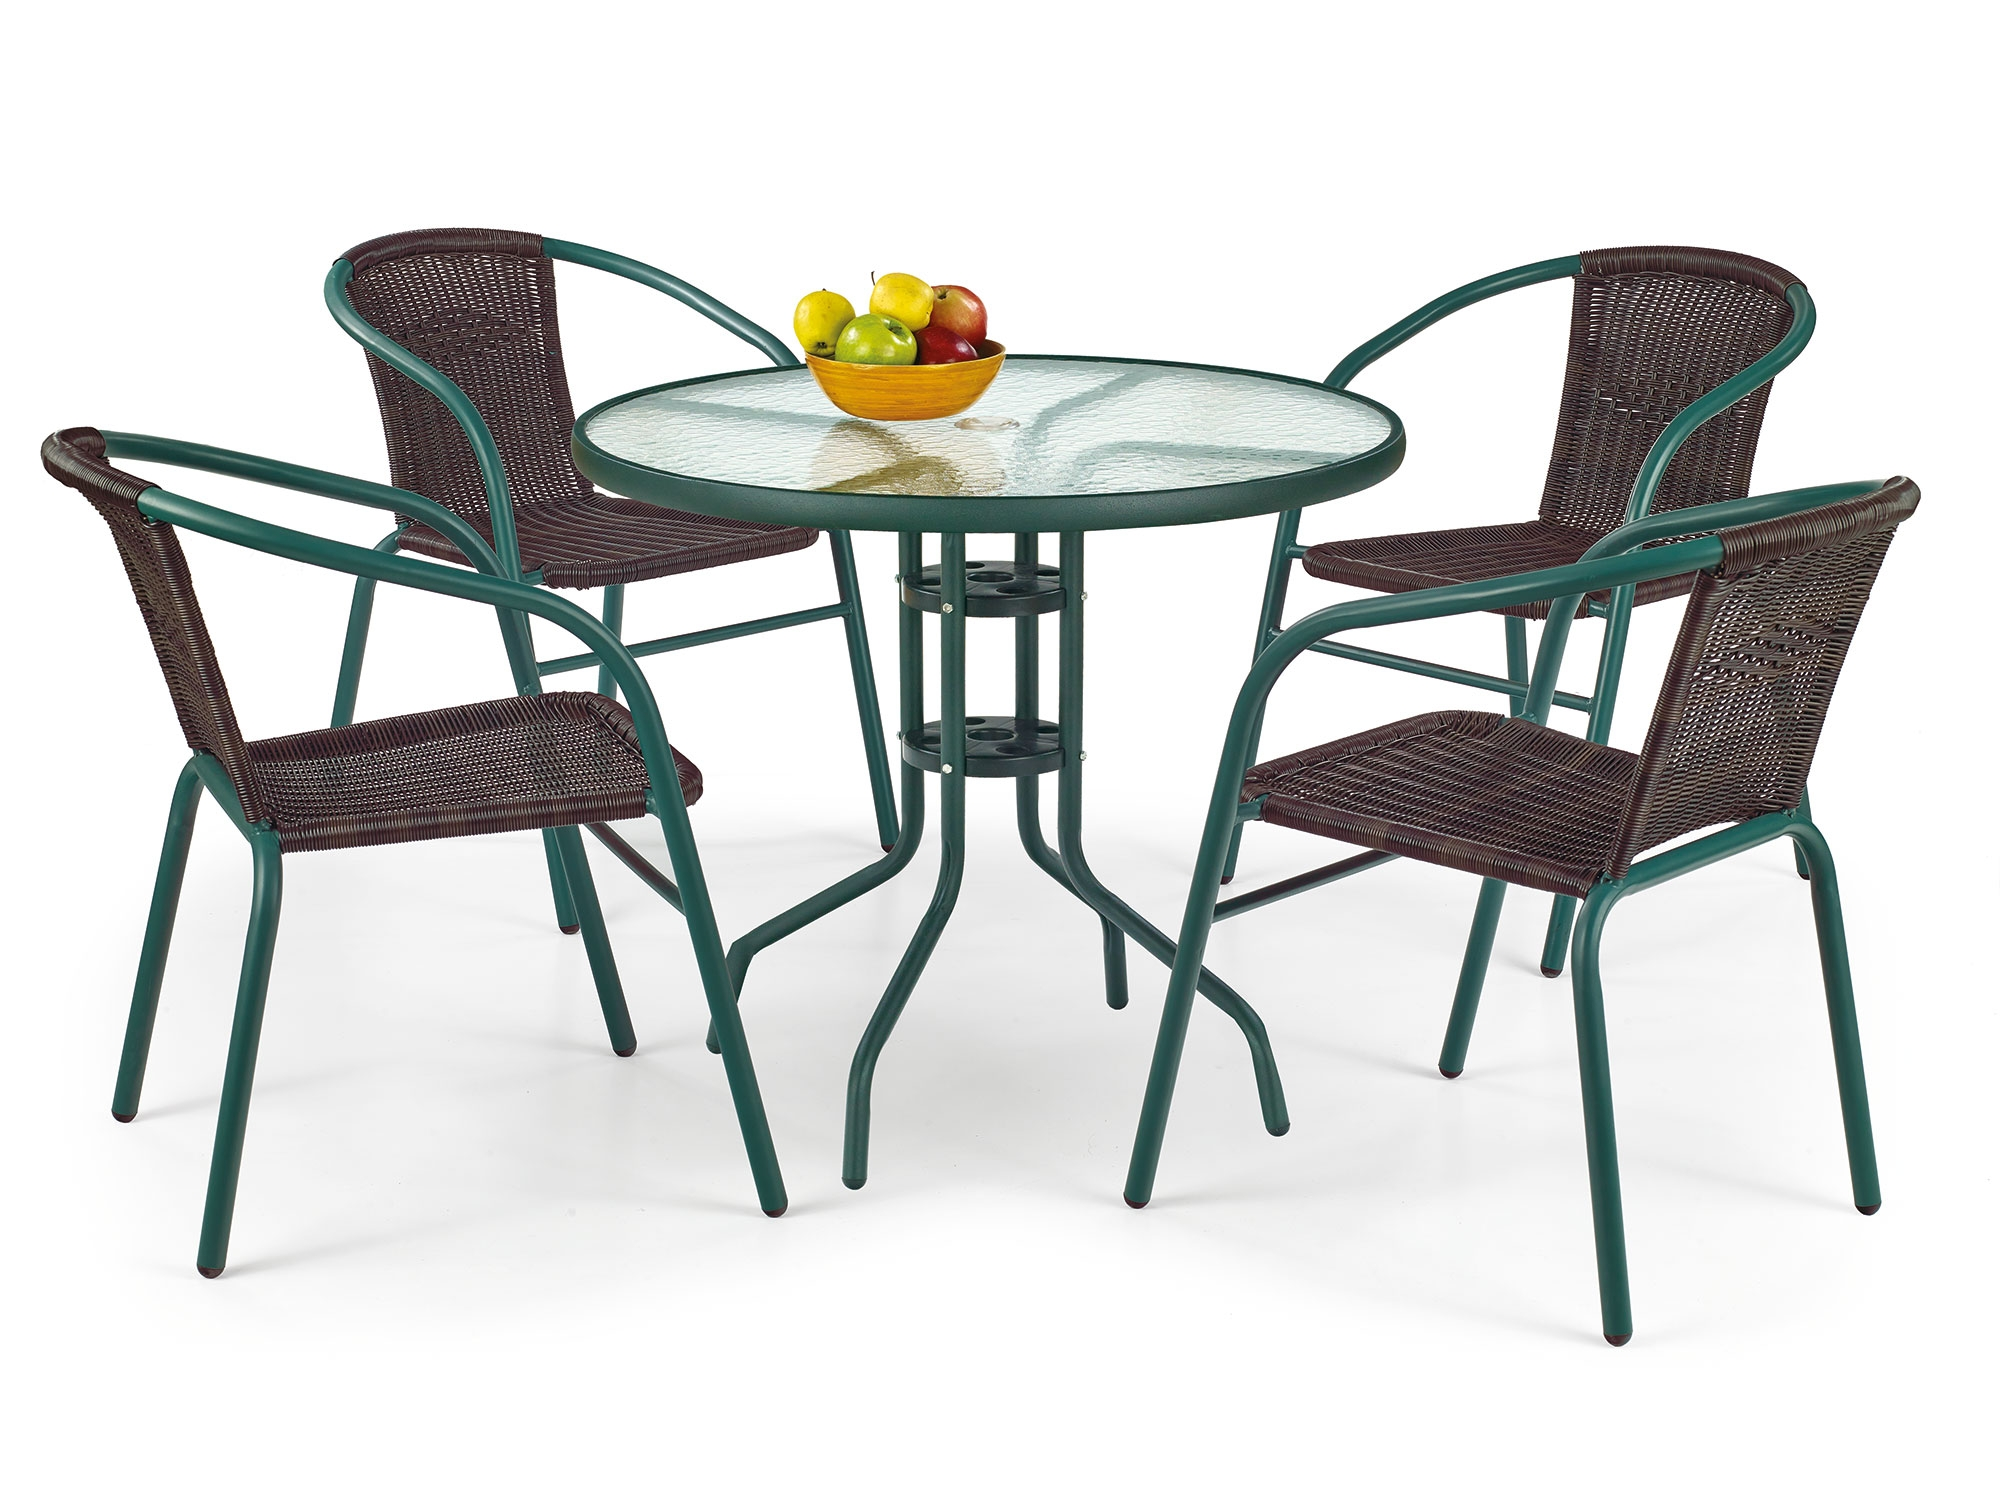 Set masa din sticla cu picioare metalice Grand Verde + 4 scaune din ratan sintetic Grand II Maro / Verde, Ø80xh72 cm poza